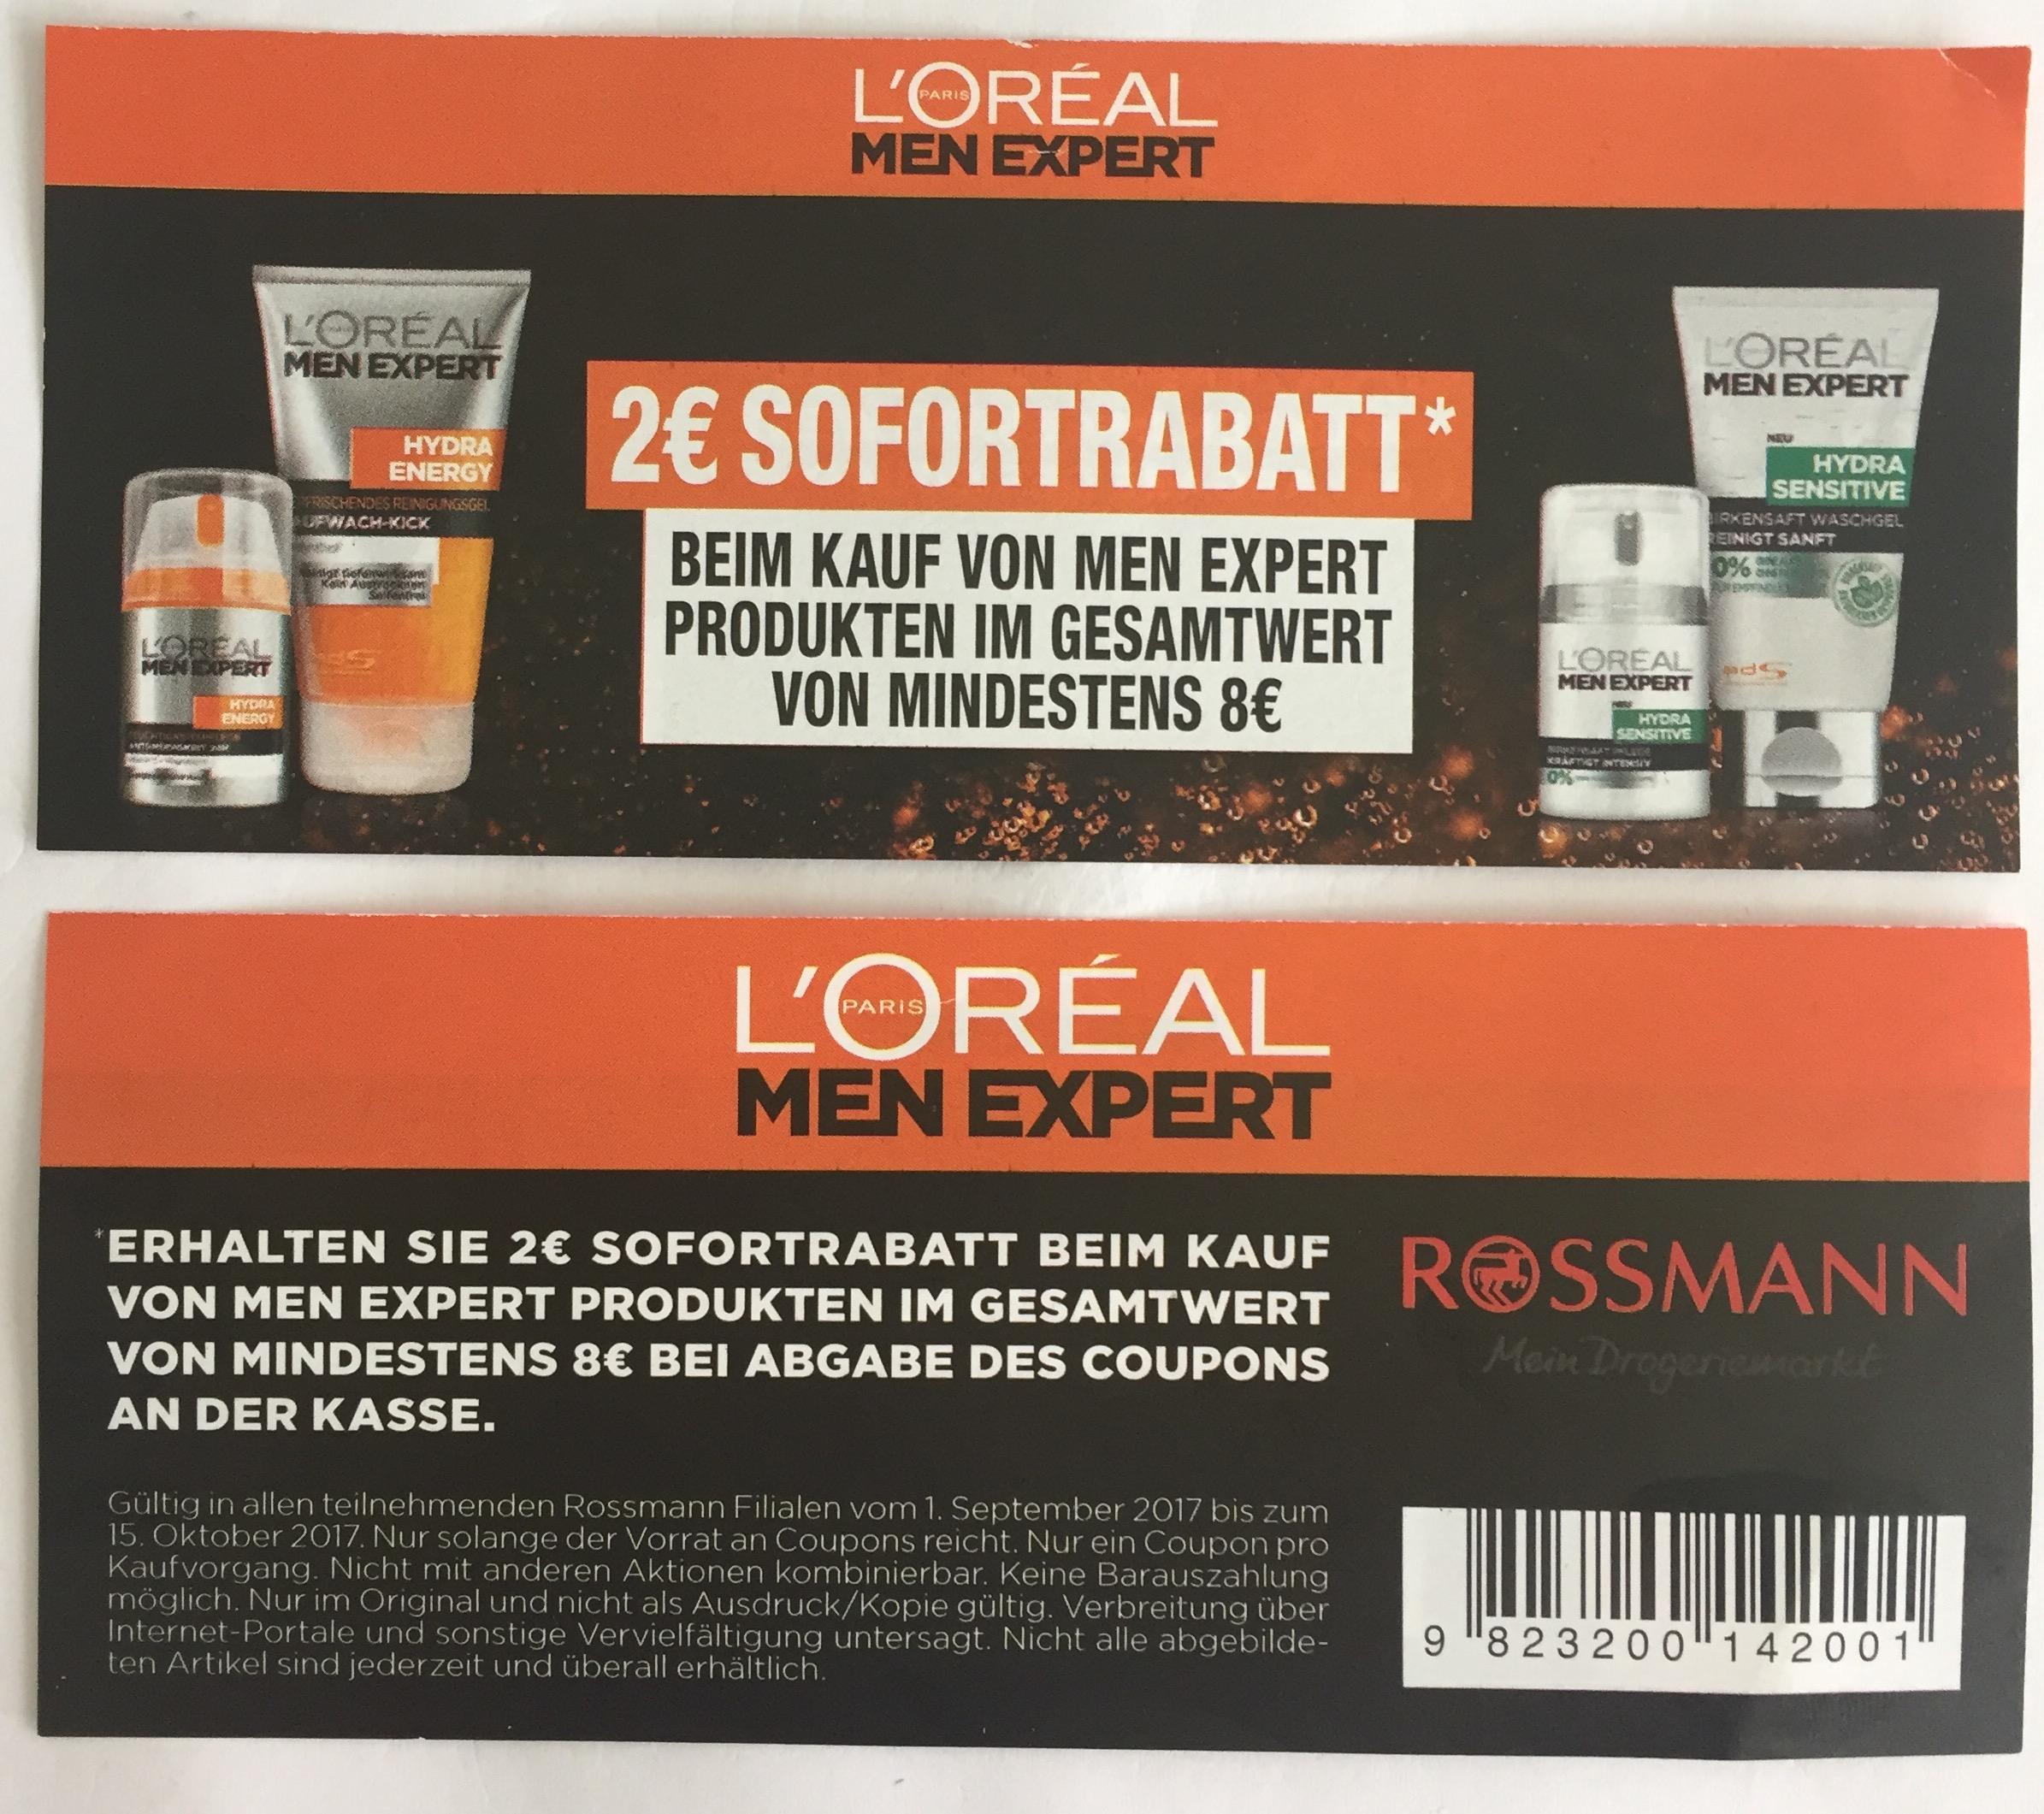 L'Oreal Men Expert 2 Euro Sofortrabatt bei Rossmann